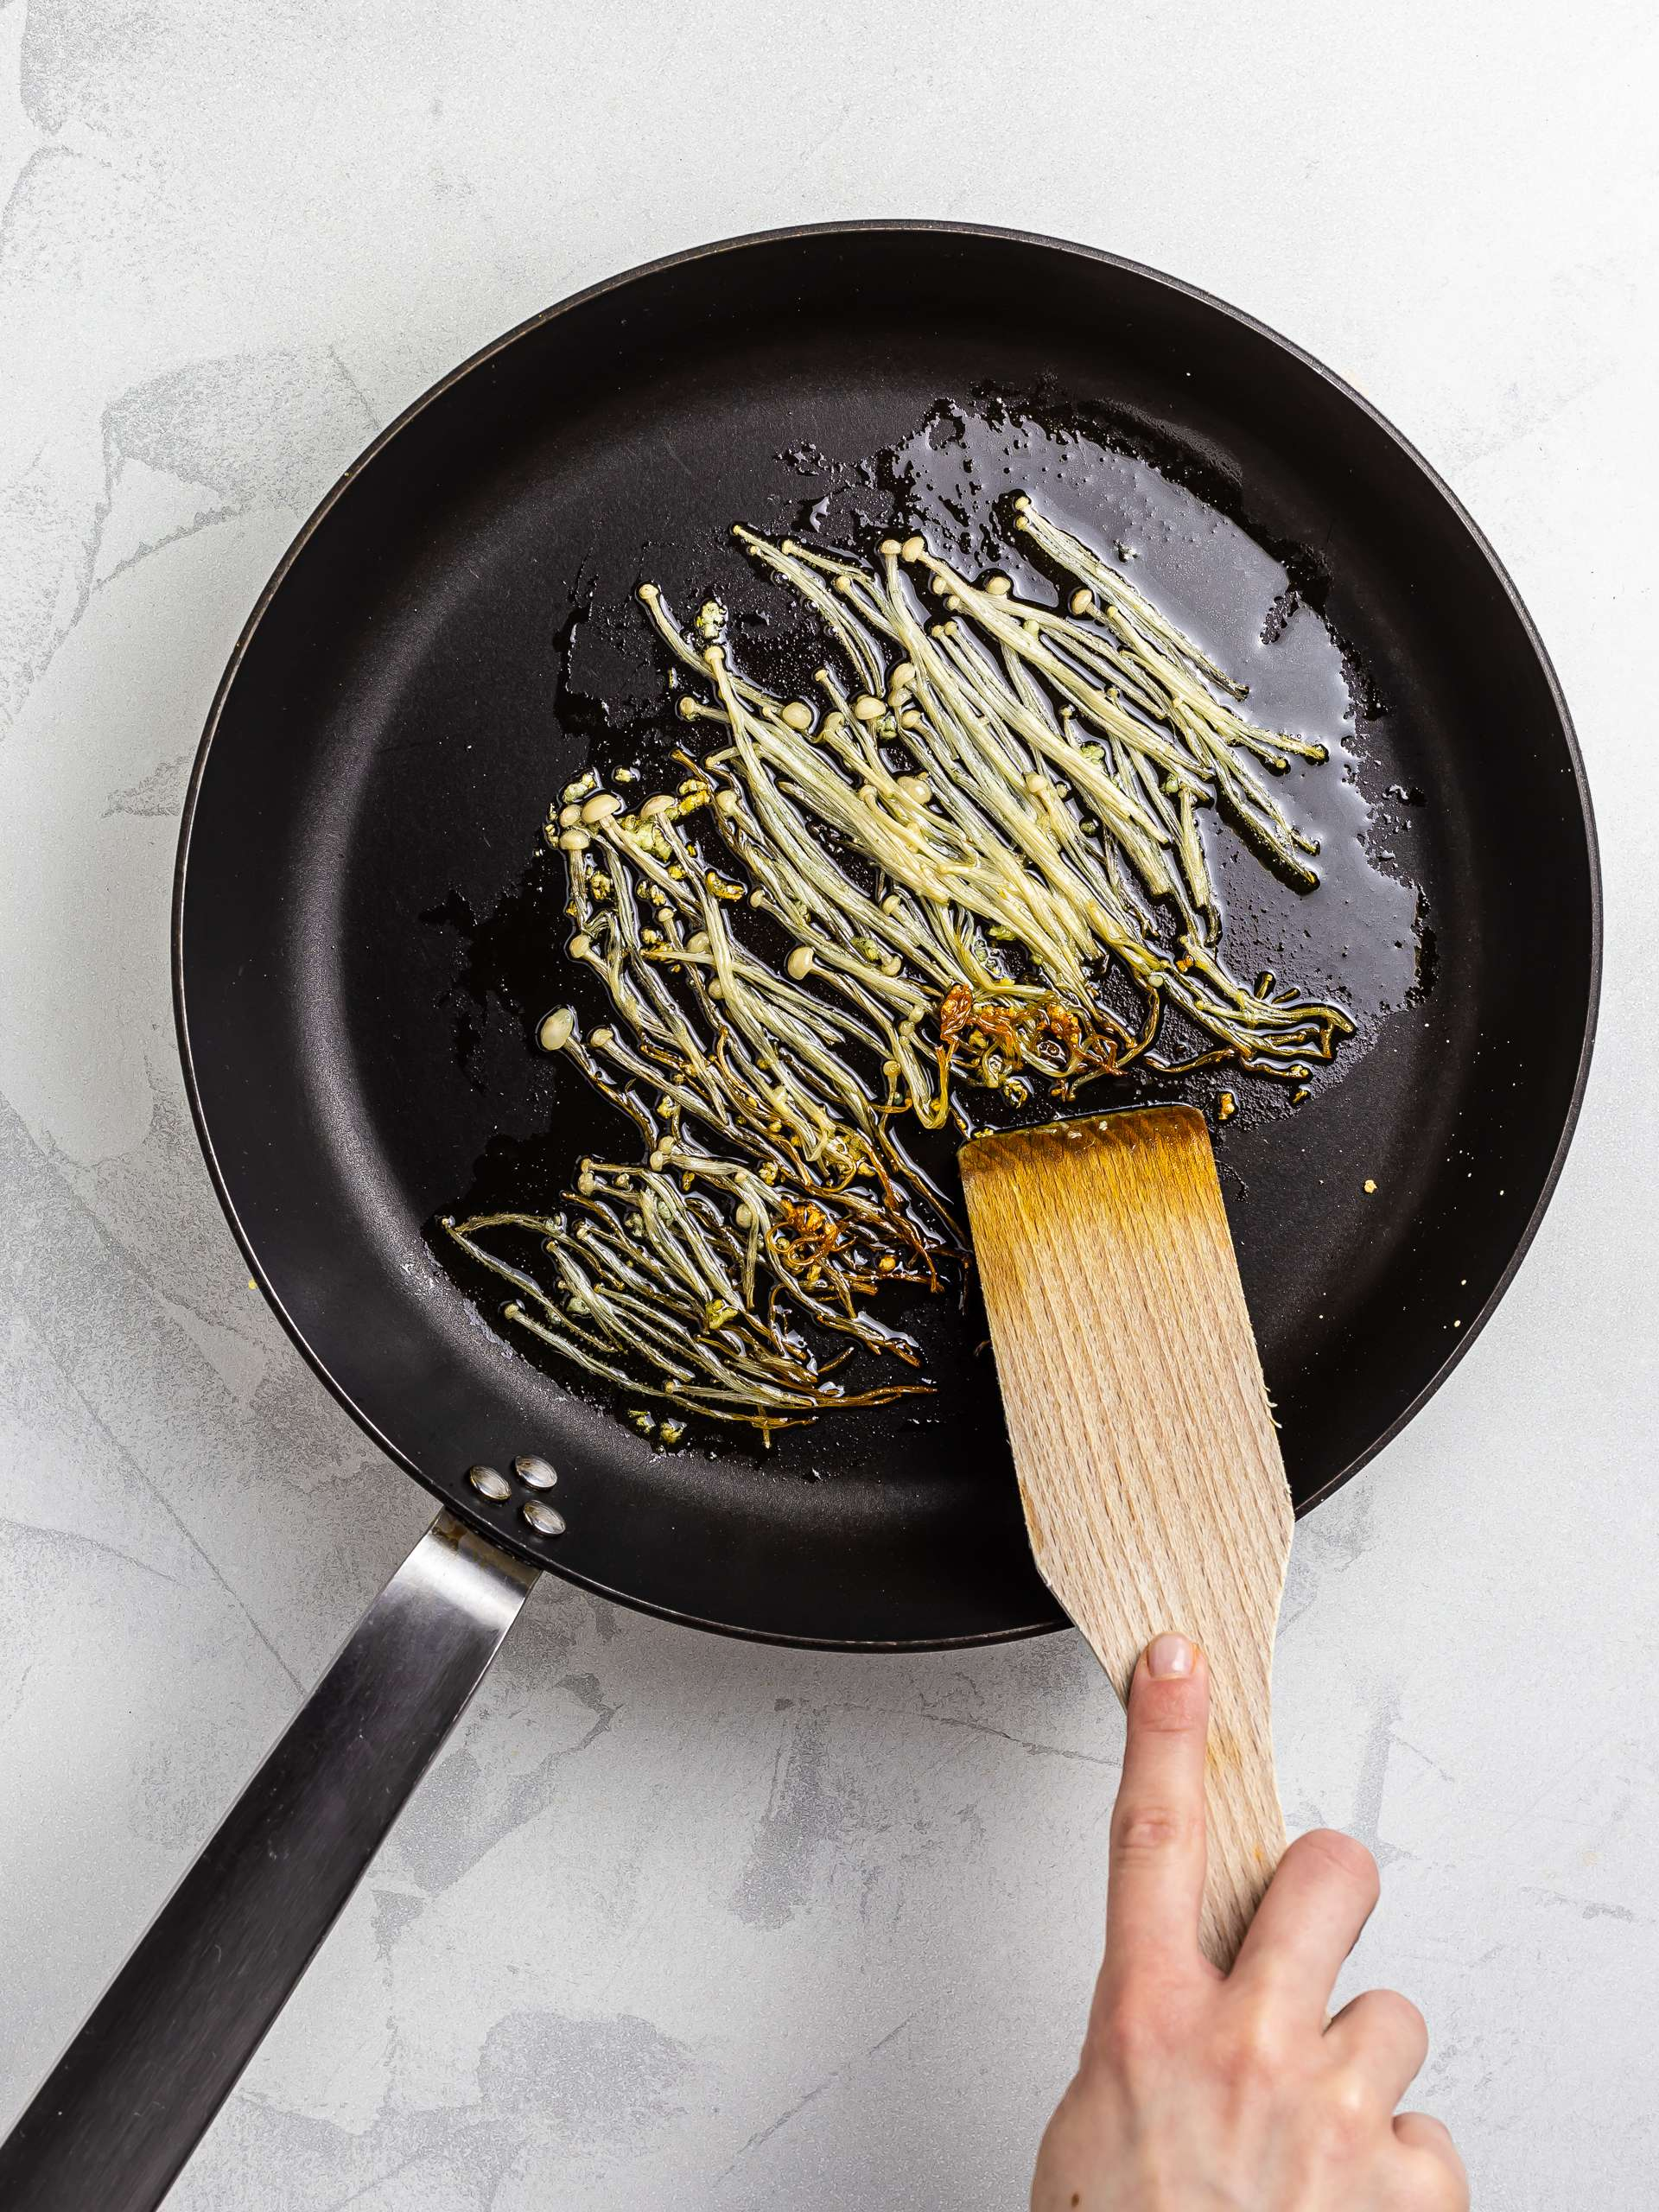 enkoi mushrooms sautéed with garlic and sesame oil